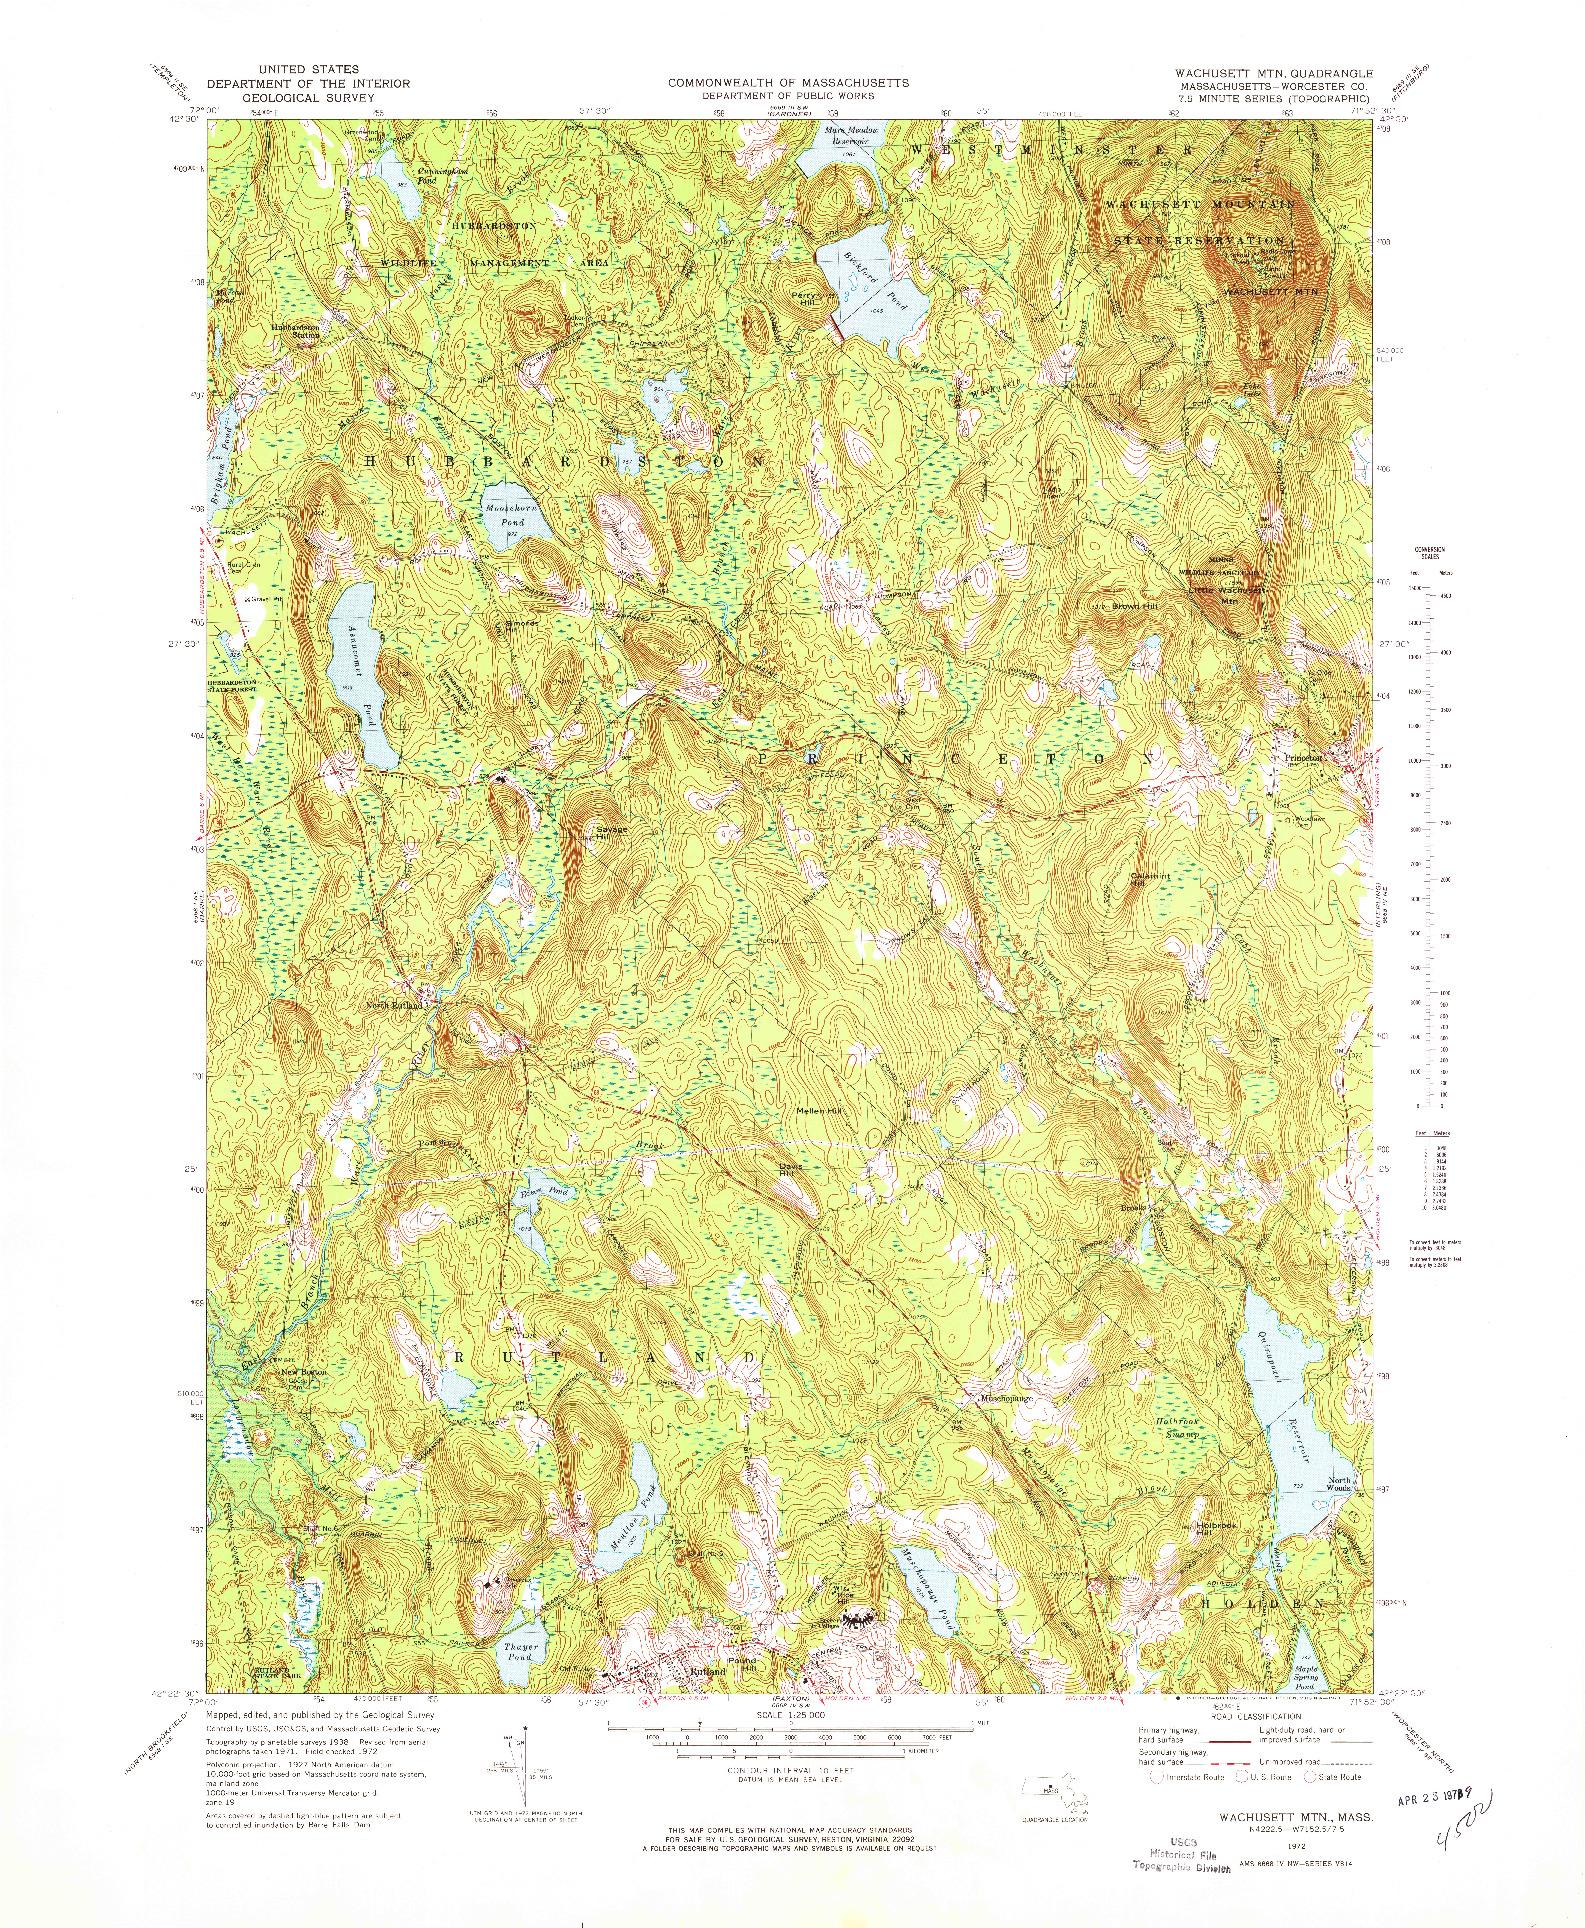 USGS 1:25000-SCALE QUADRANGLE FOR WACHUSETT MTN, MA 1972